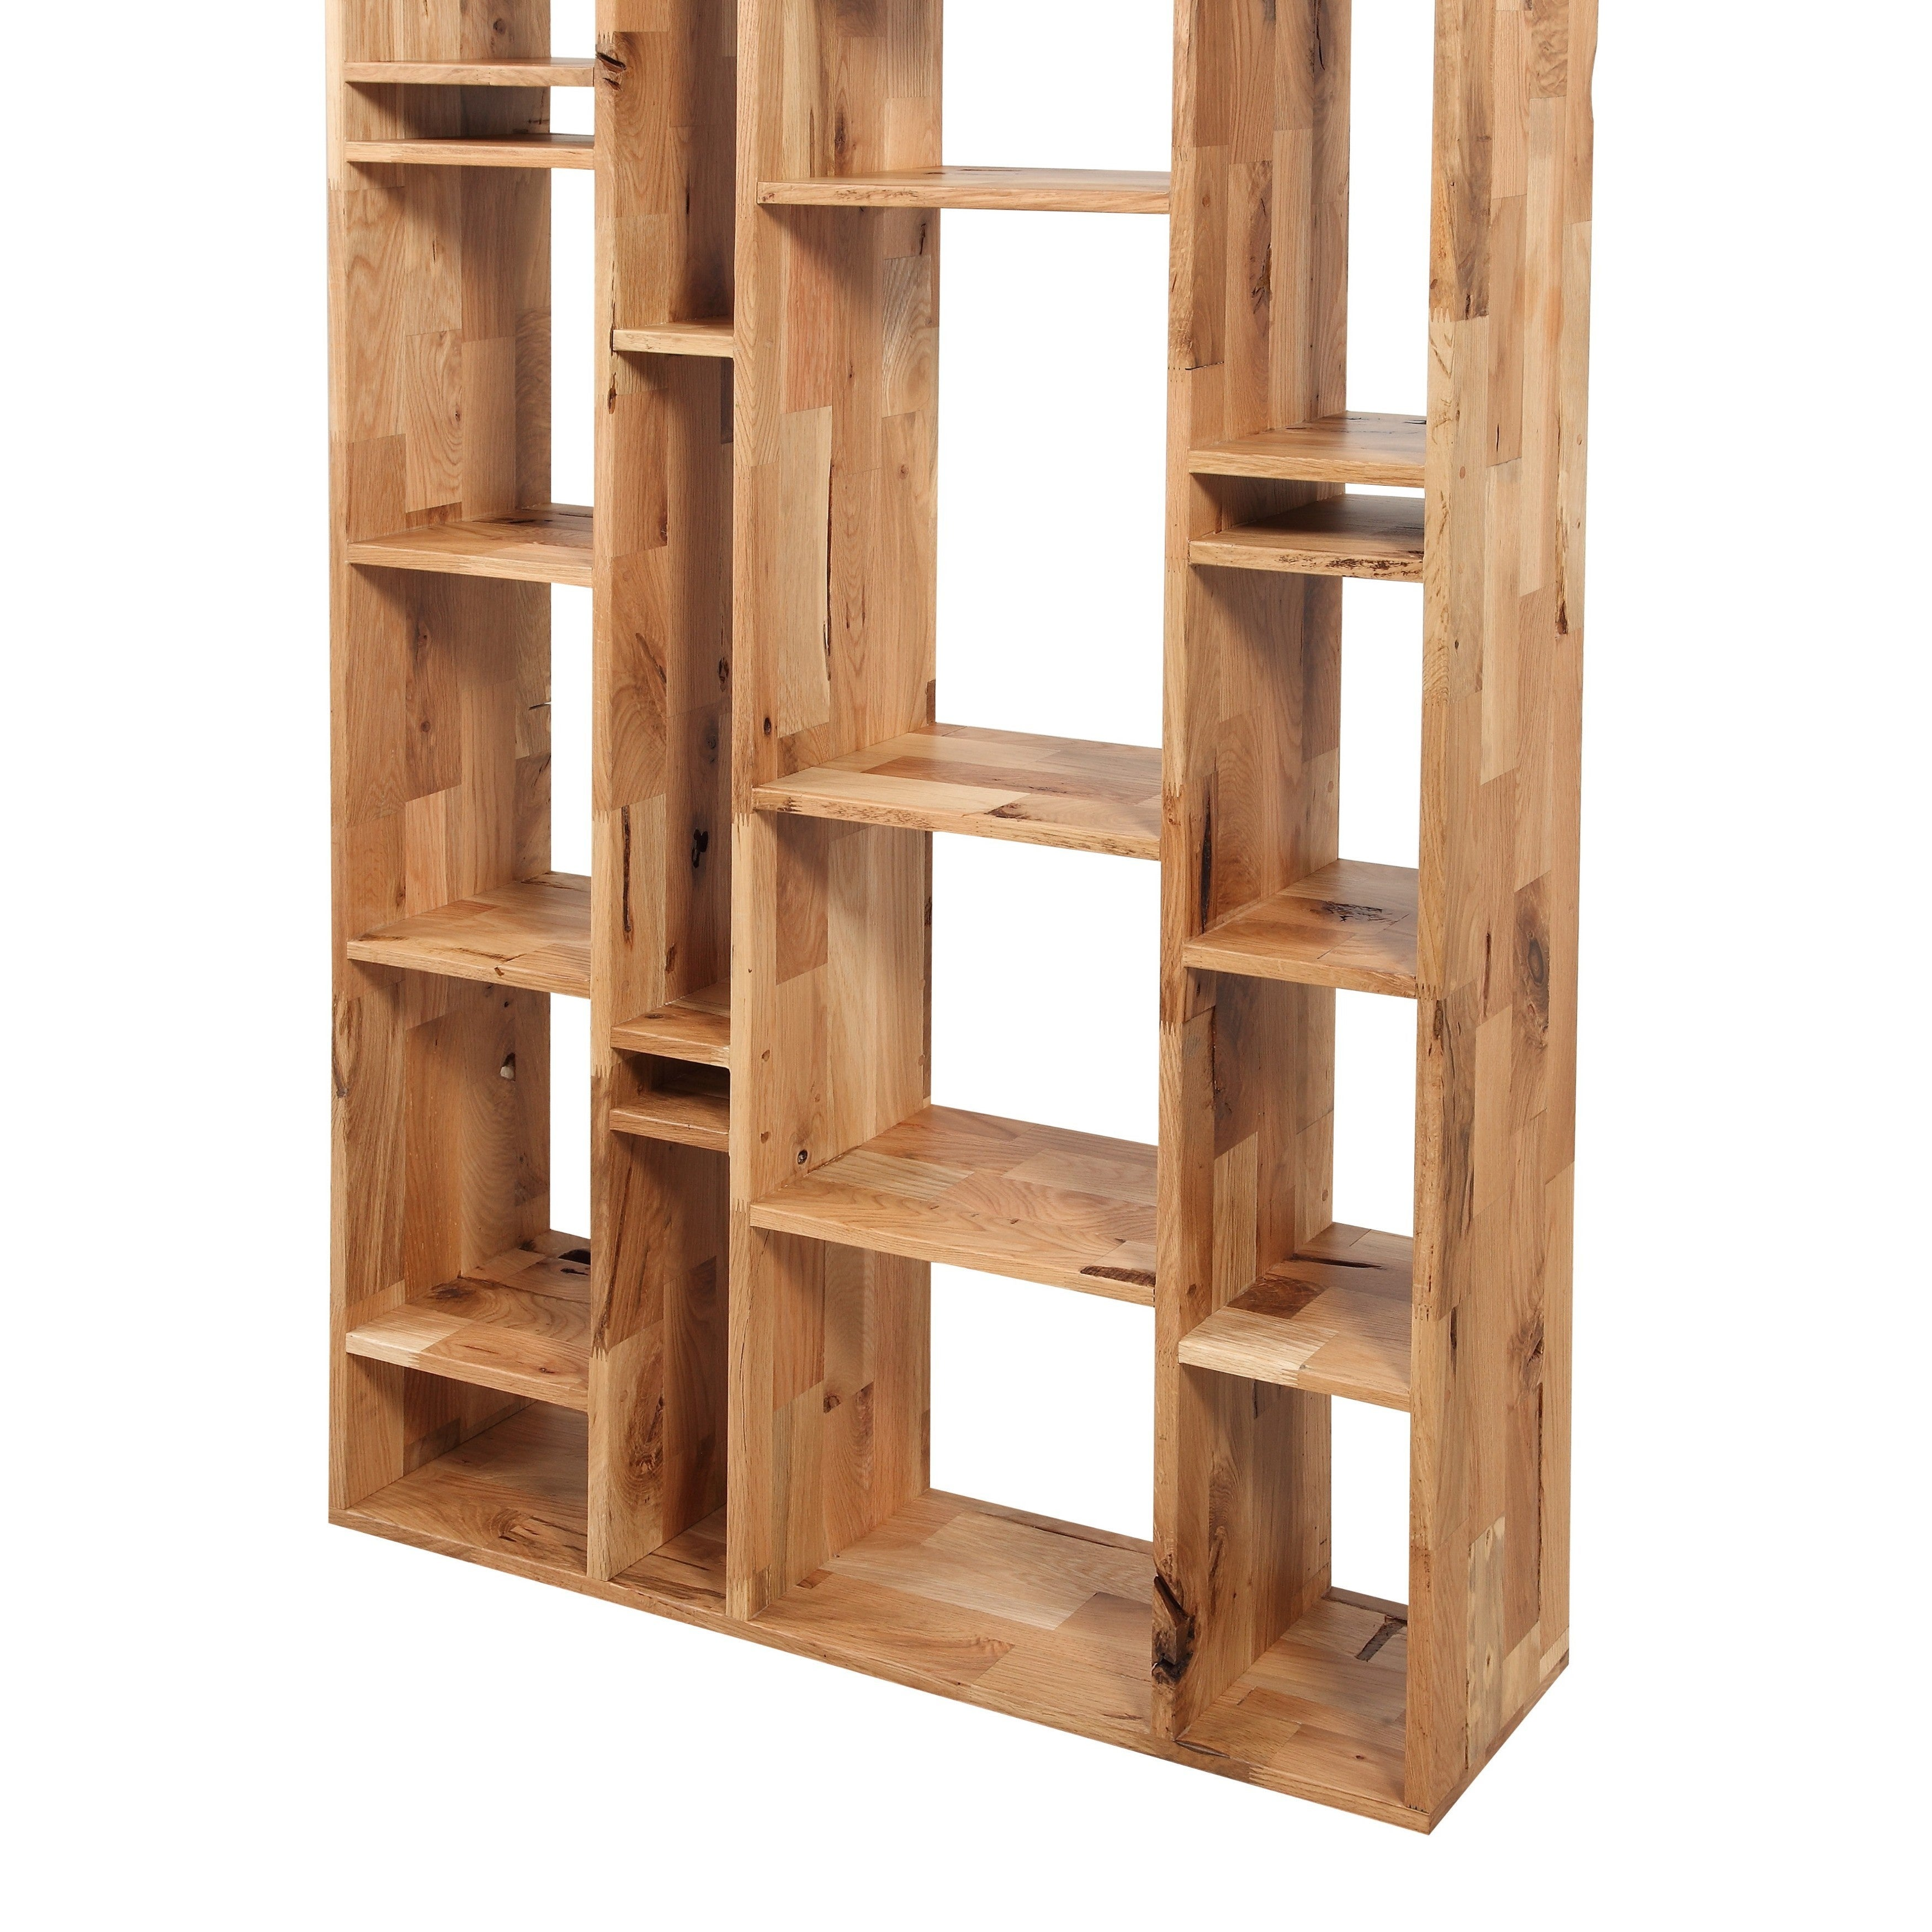 Shop Aurelle Home Sled Wooden Rustic Bookshelf